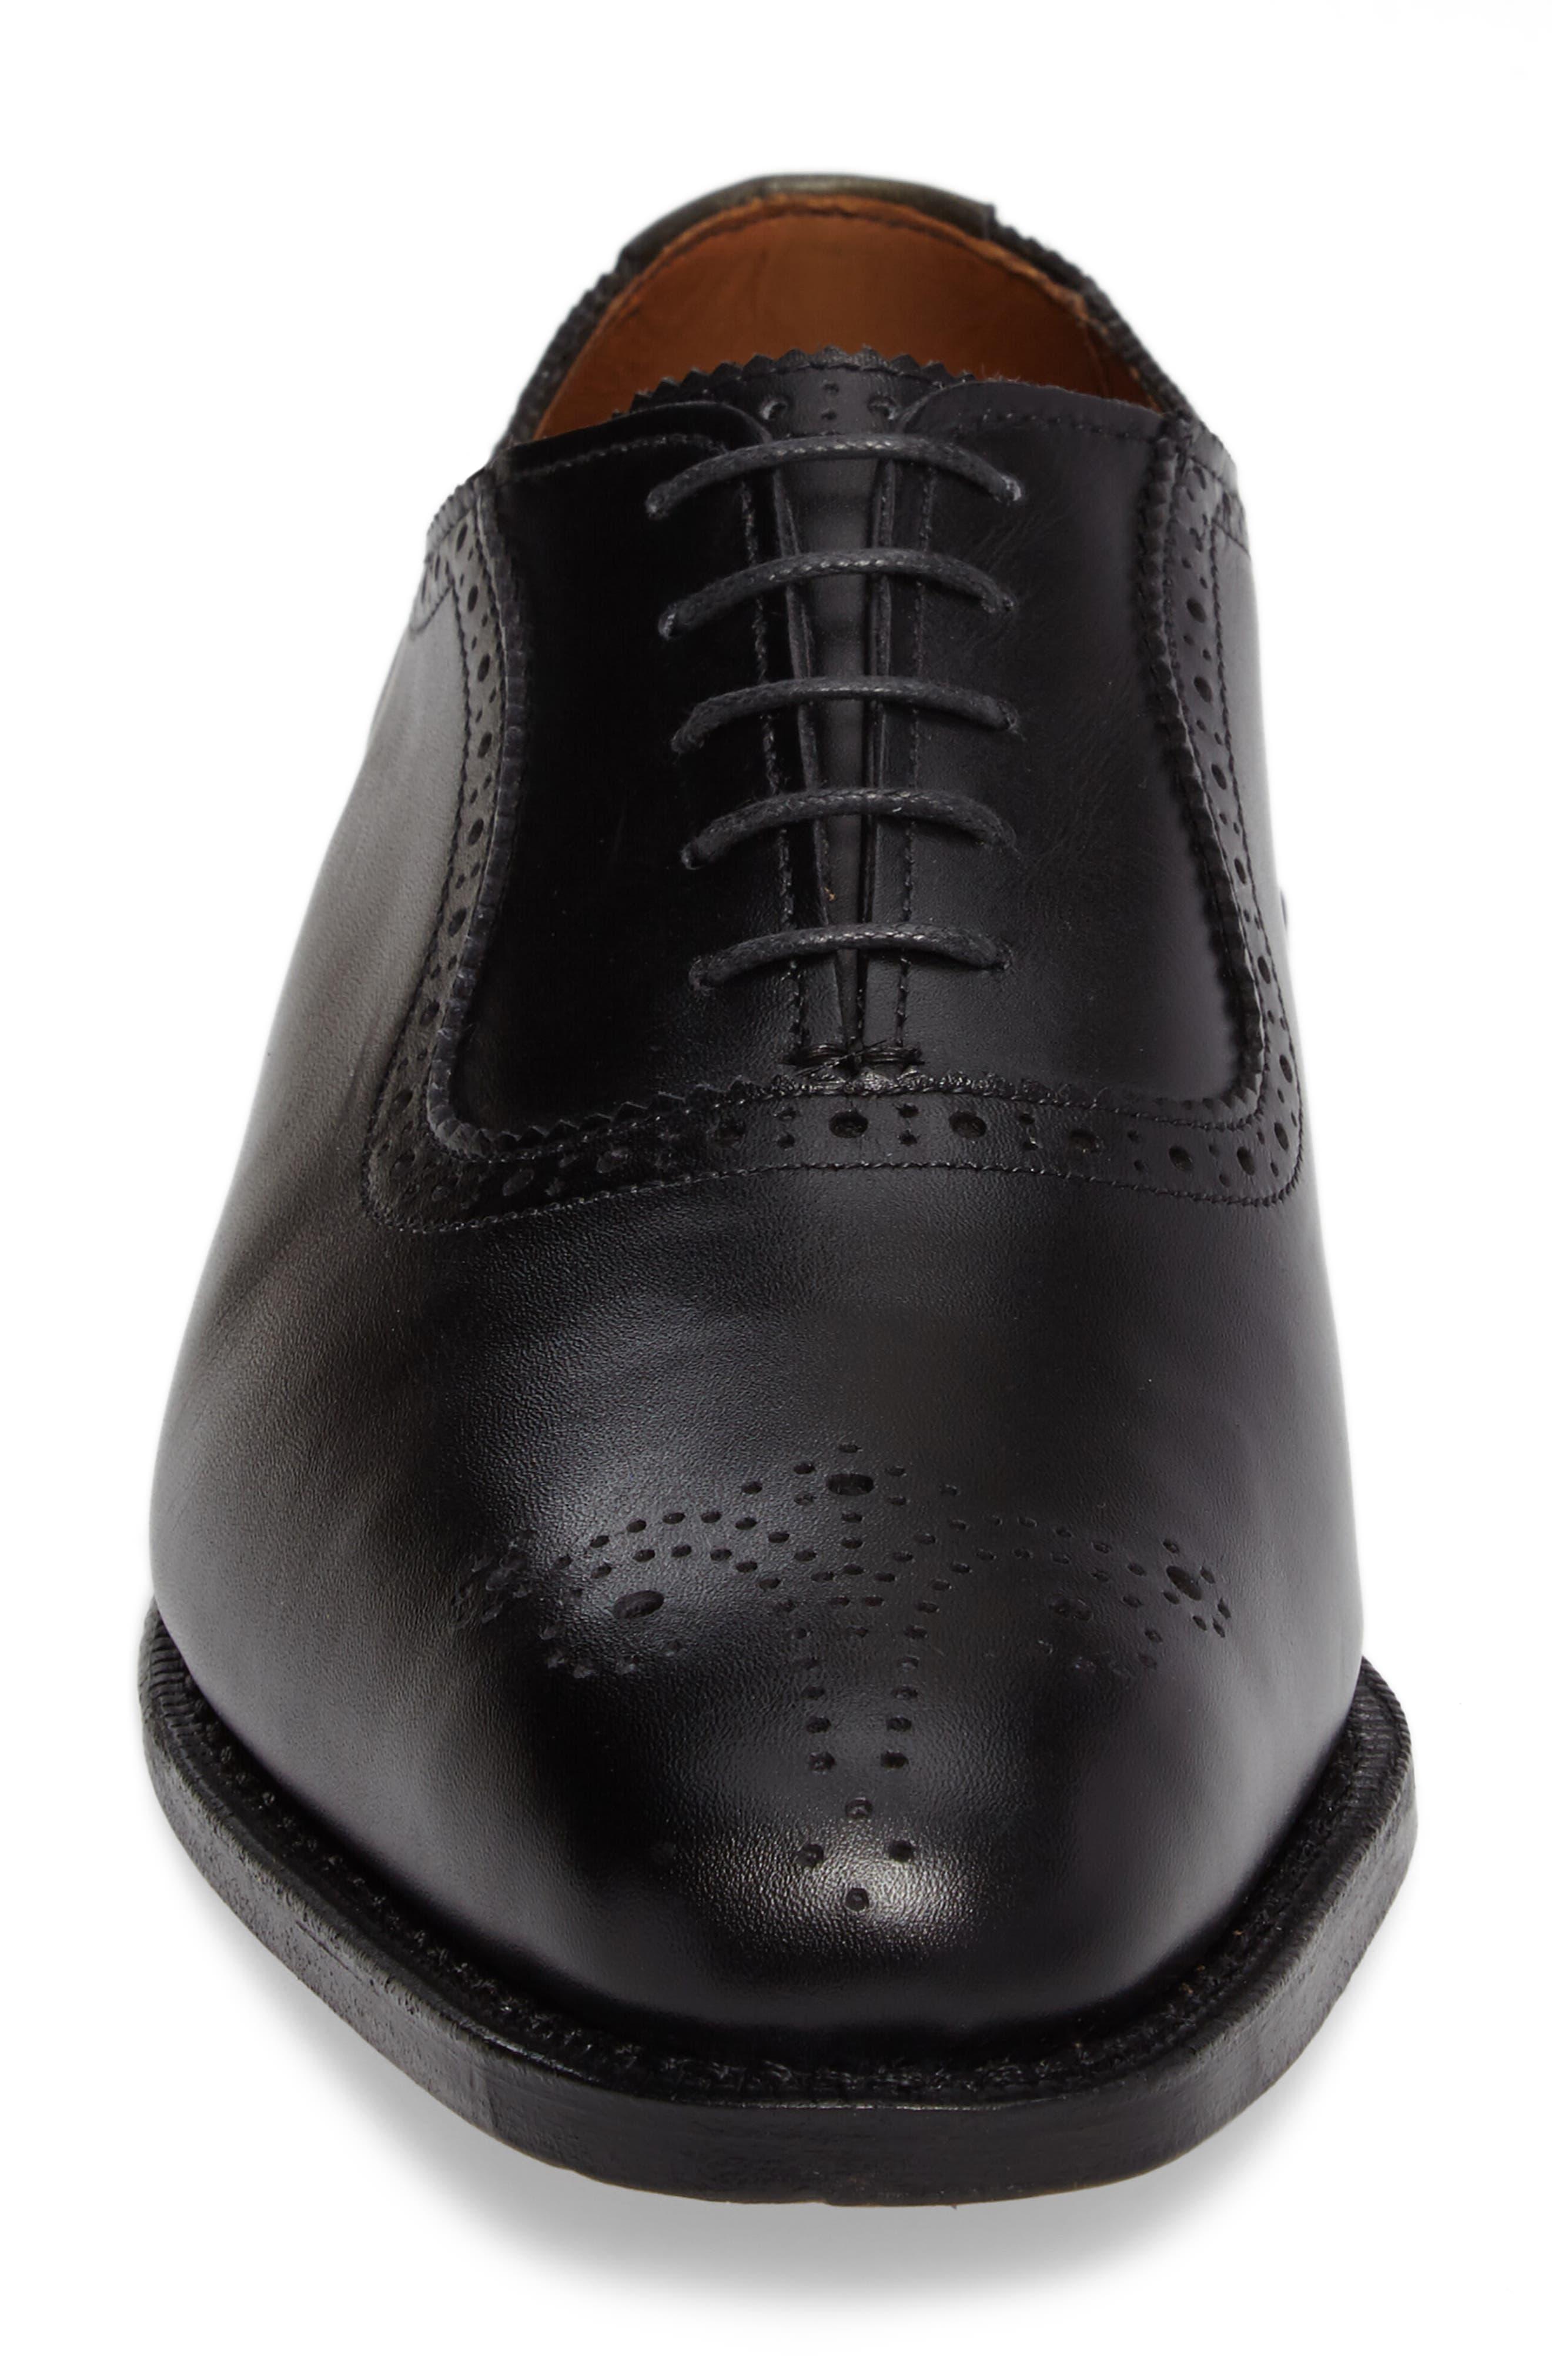 ALLEN EDMONDS, Cornwallis Medallion Toe Oxford, Alternate thumbnail 4, color, BLACK